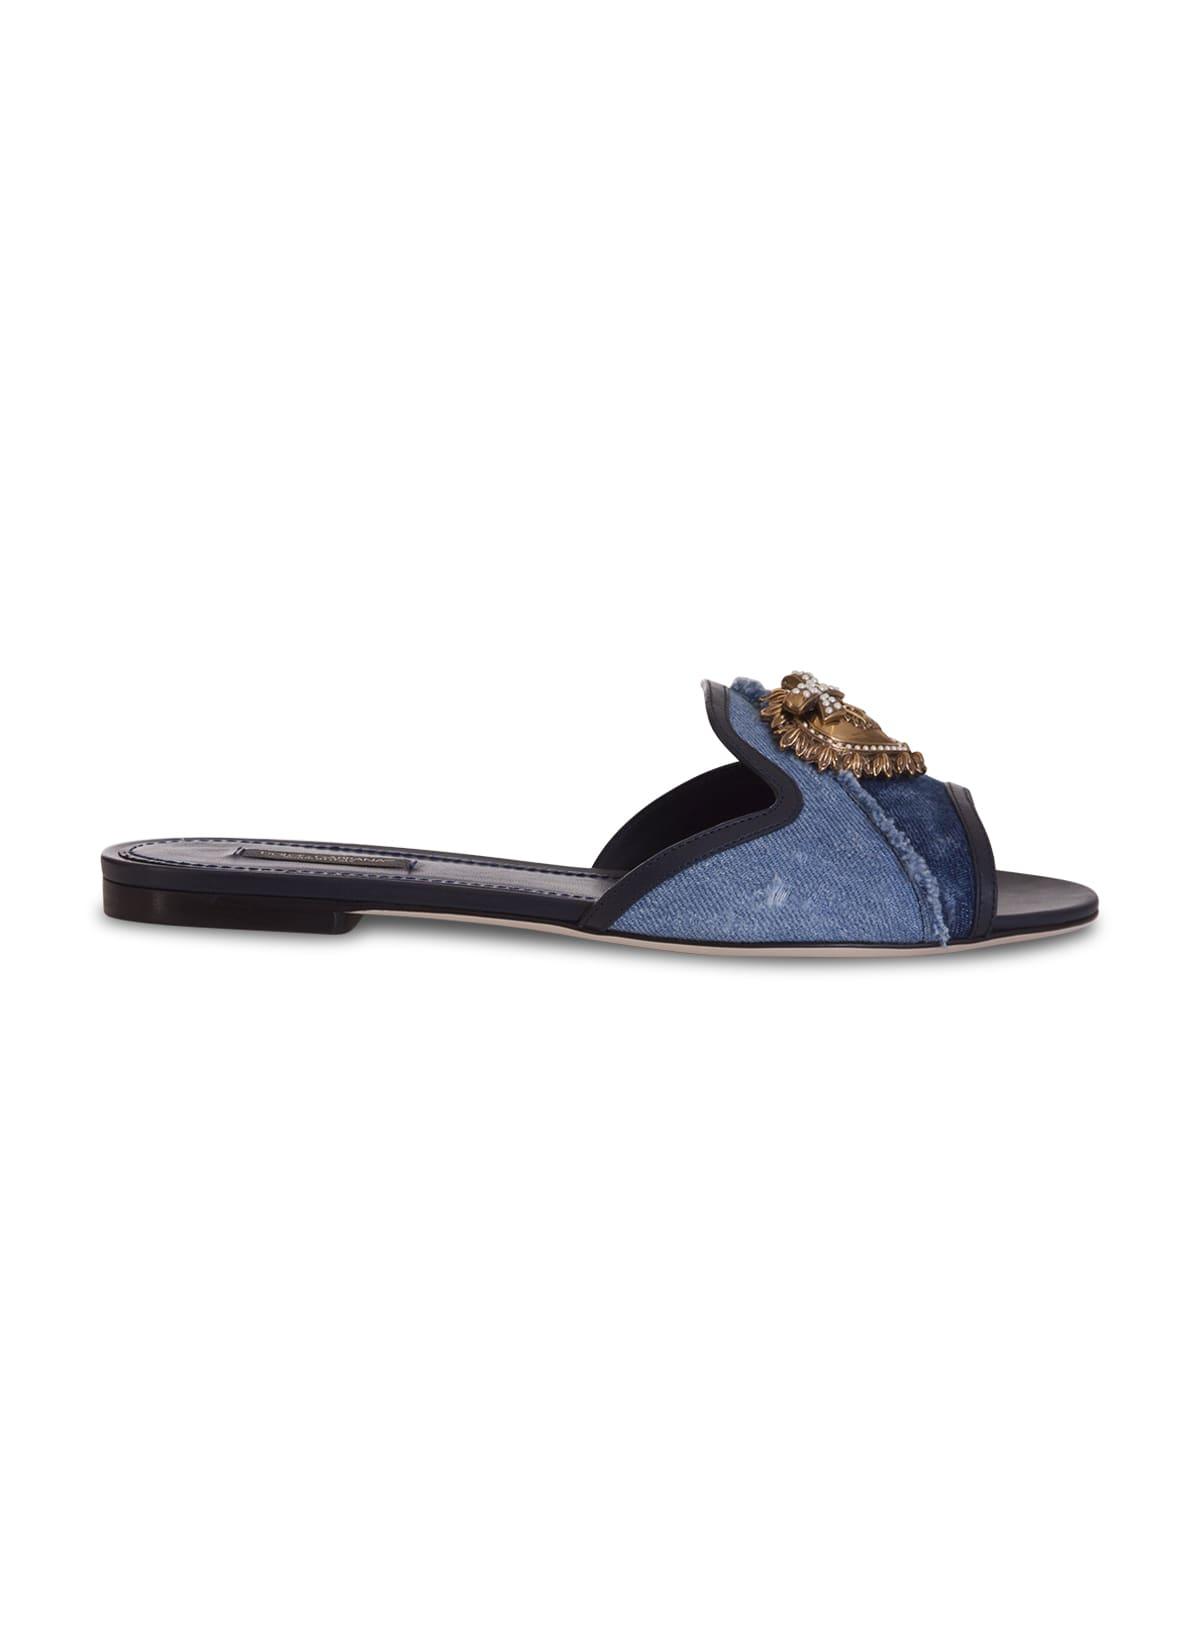 Buy Dolce & Gabbana Devotion Mule In Denim online, shop Dolce & Gabbana shoes with free shipping